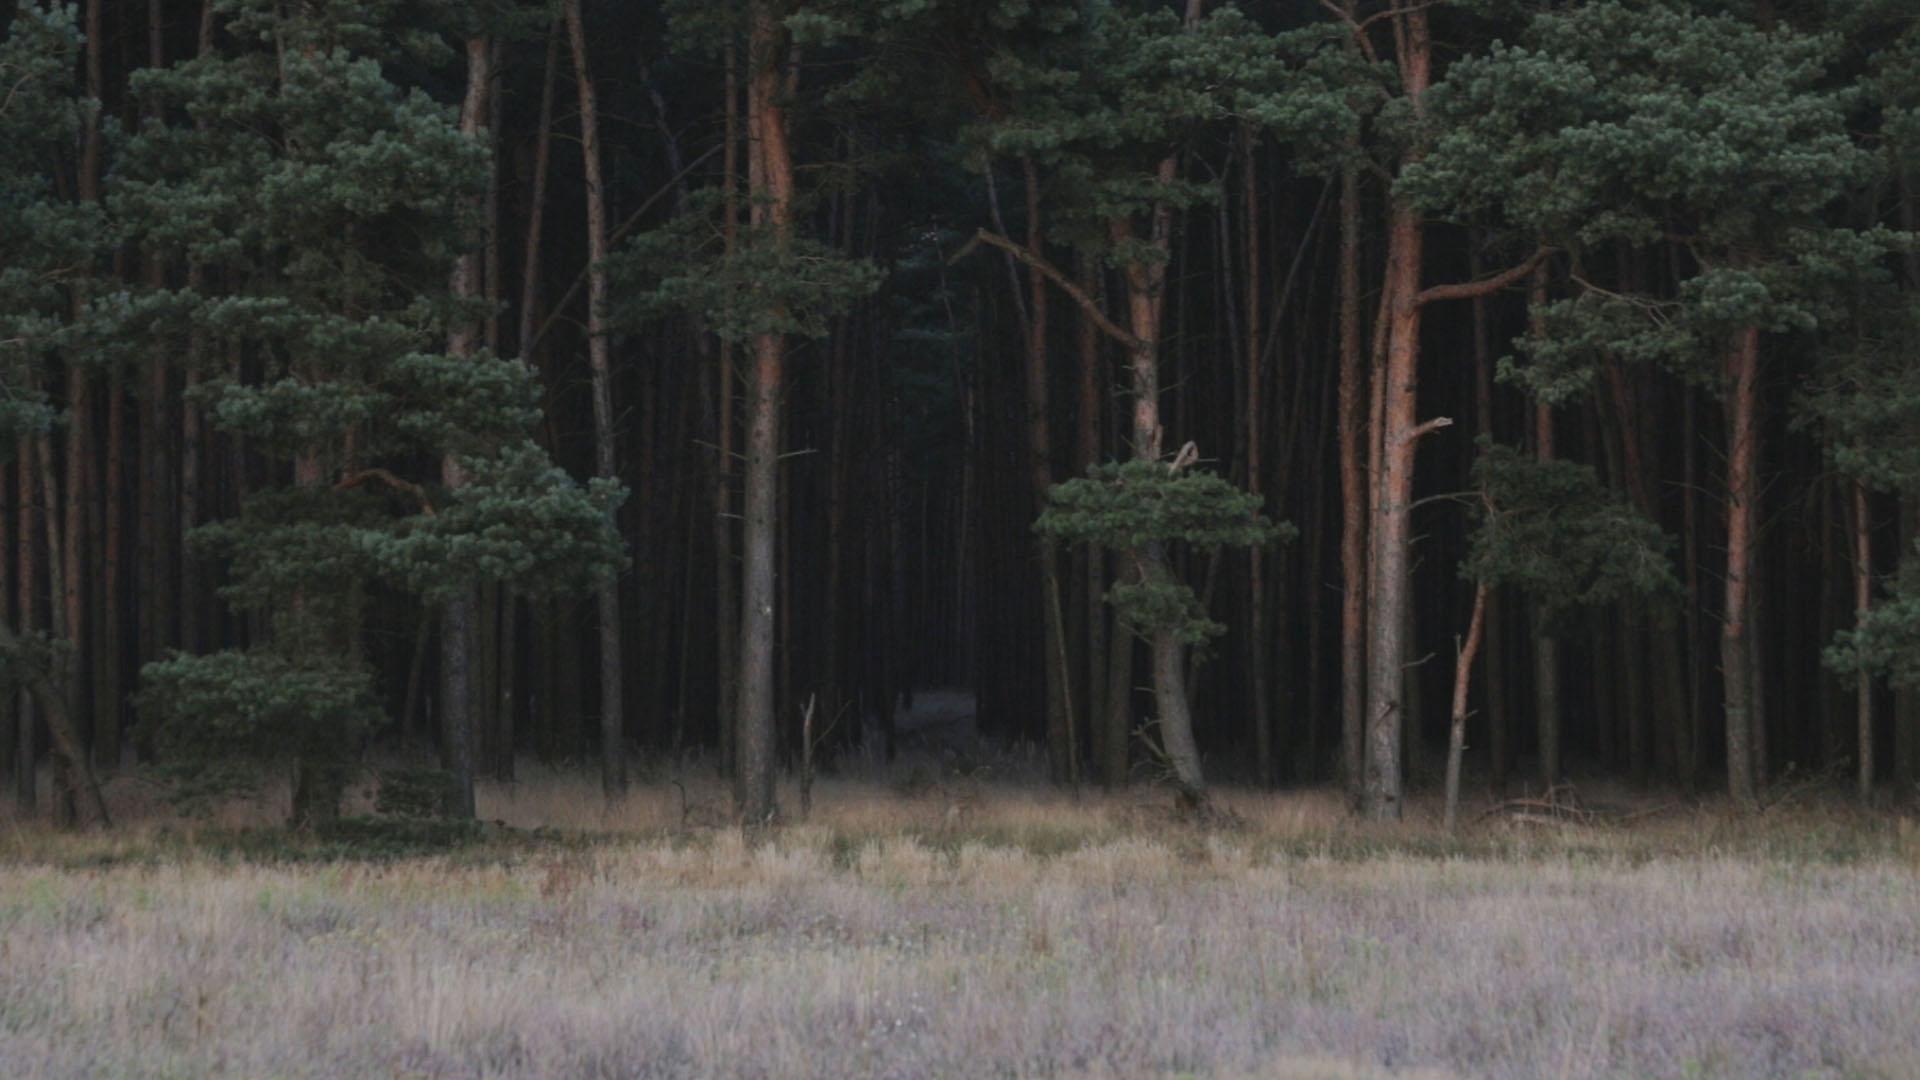 Hinter dem Wald